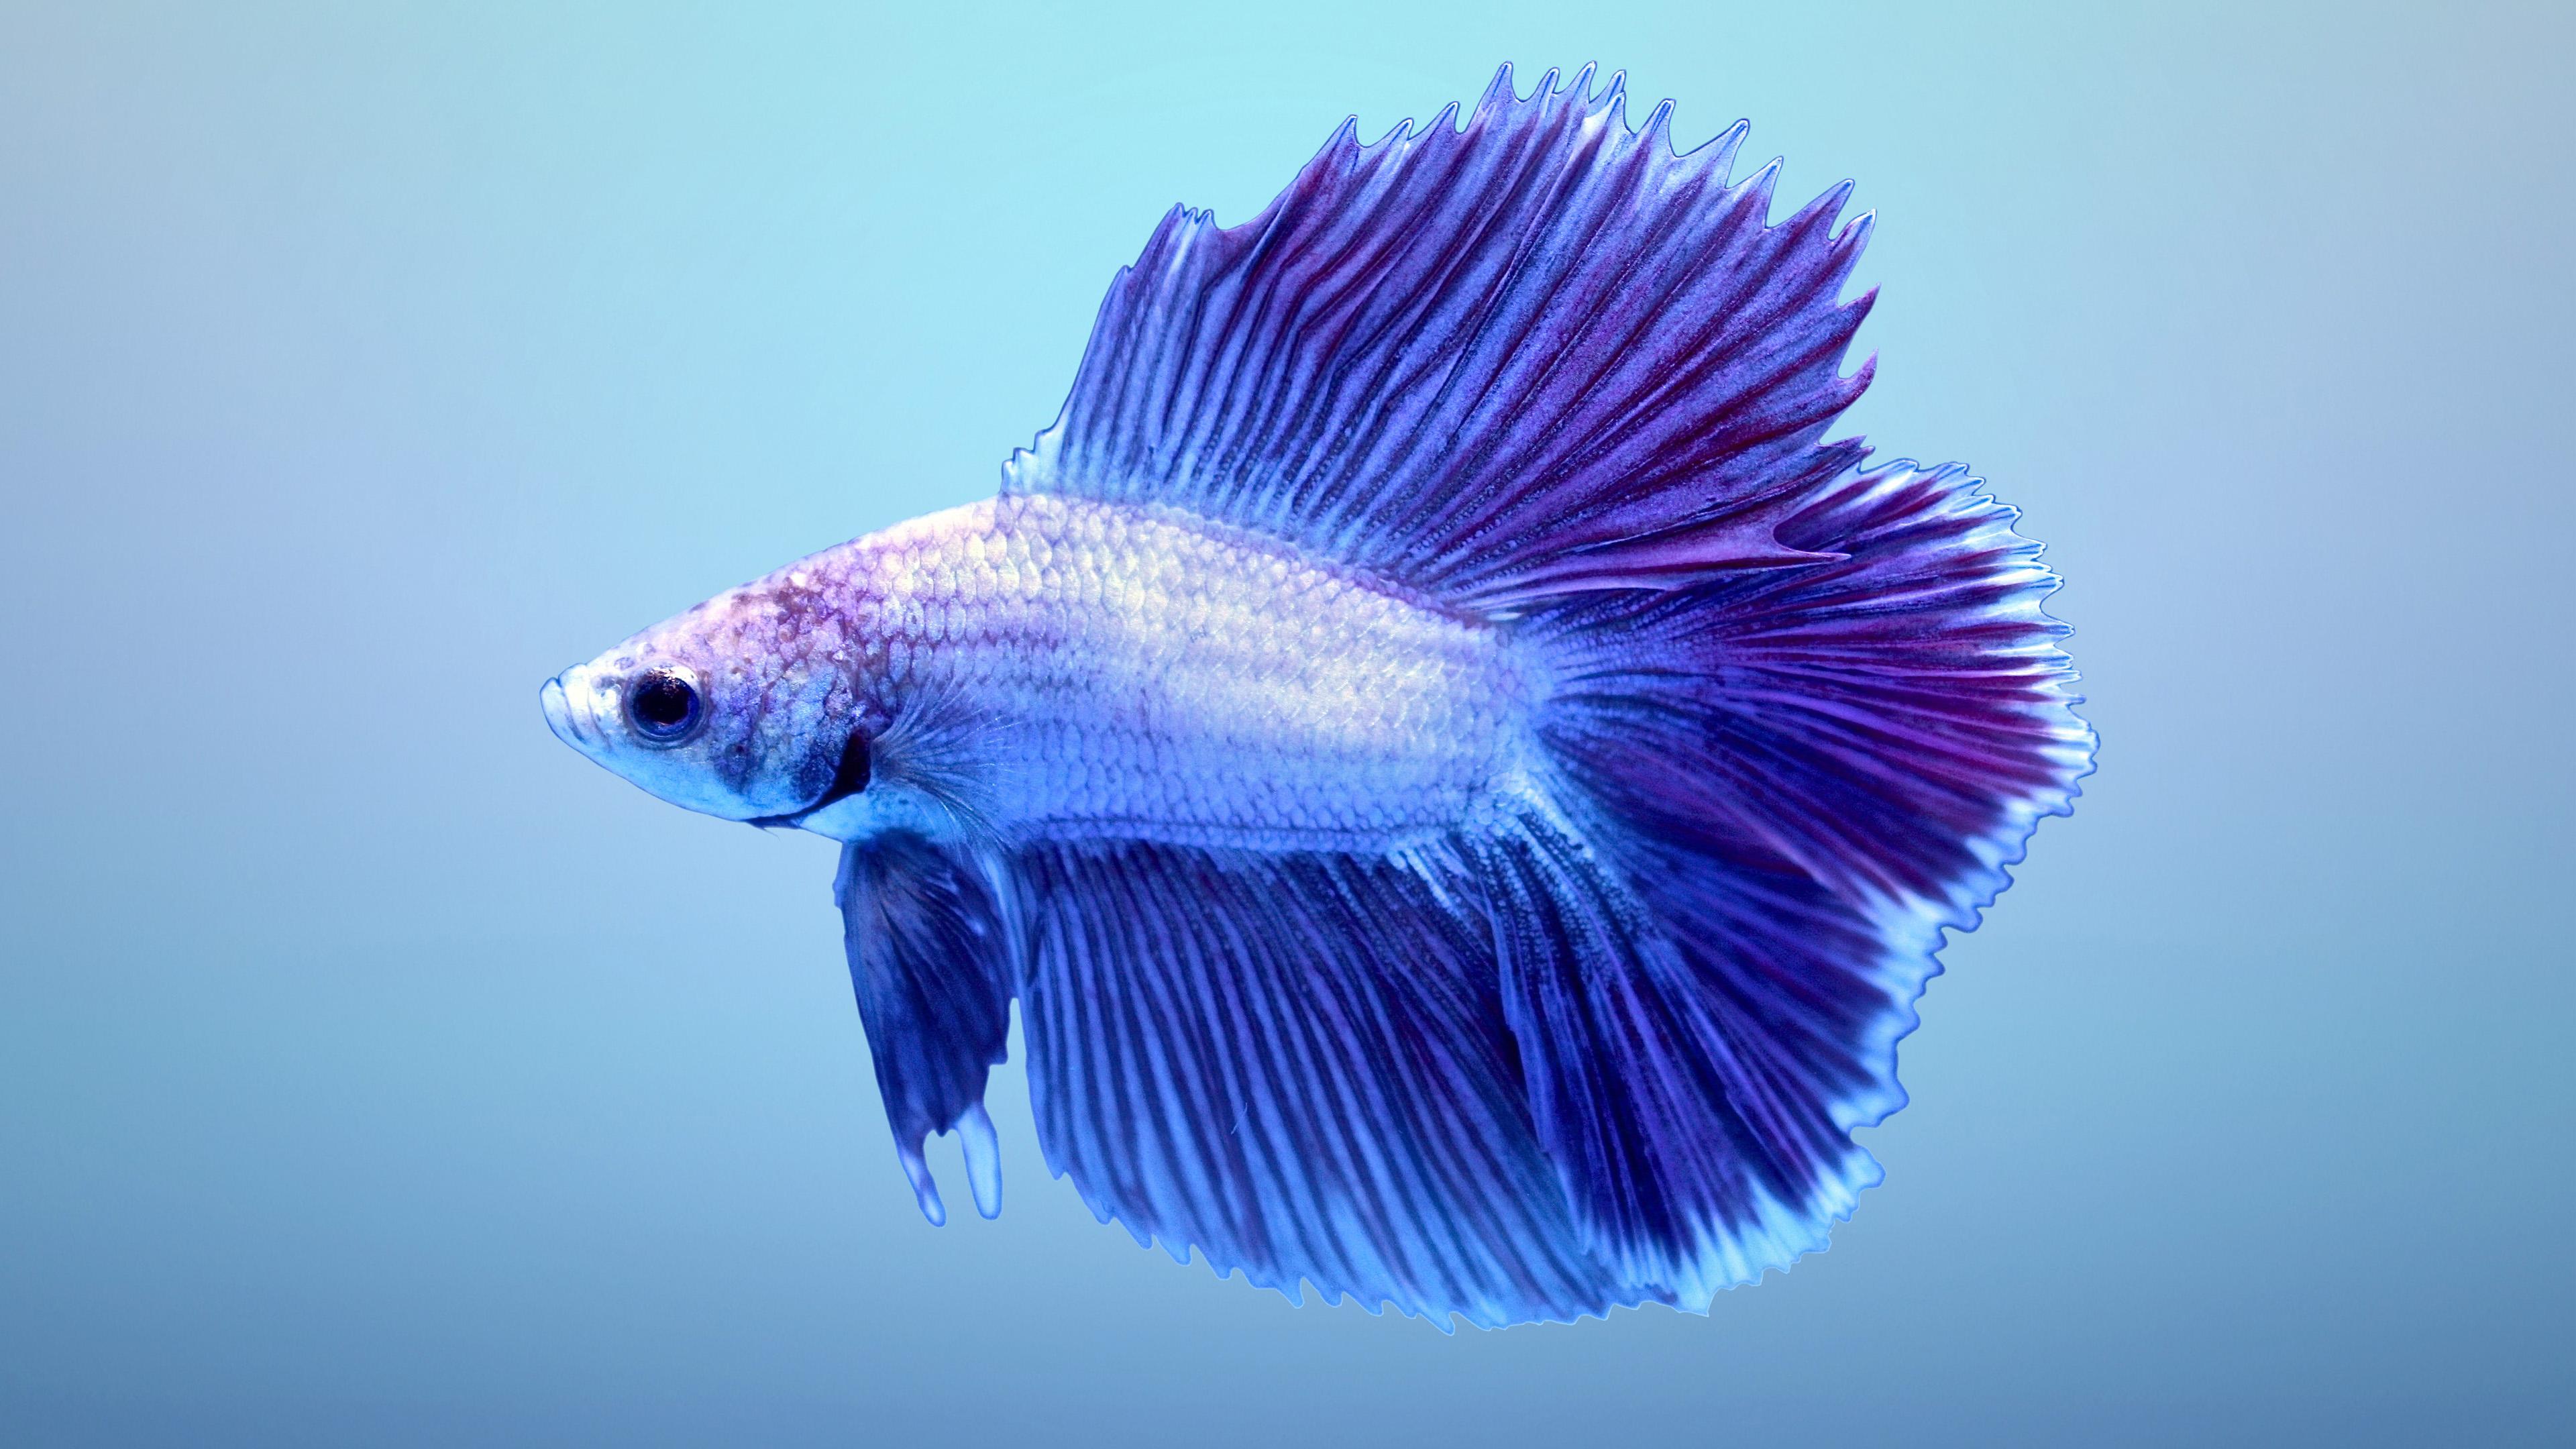 Fish Tank 3d Wallpaper Download Betta Fish Wallpapers Hd Pixelstalk Net